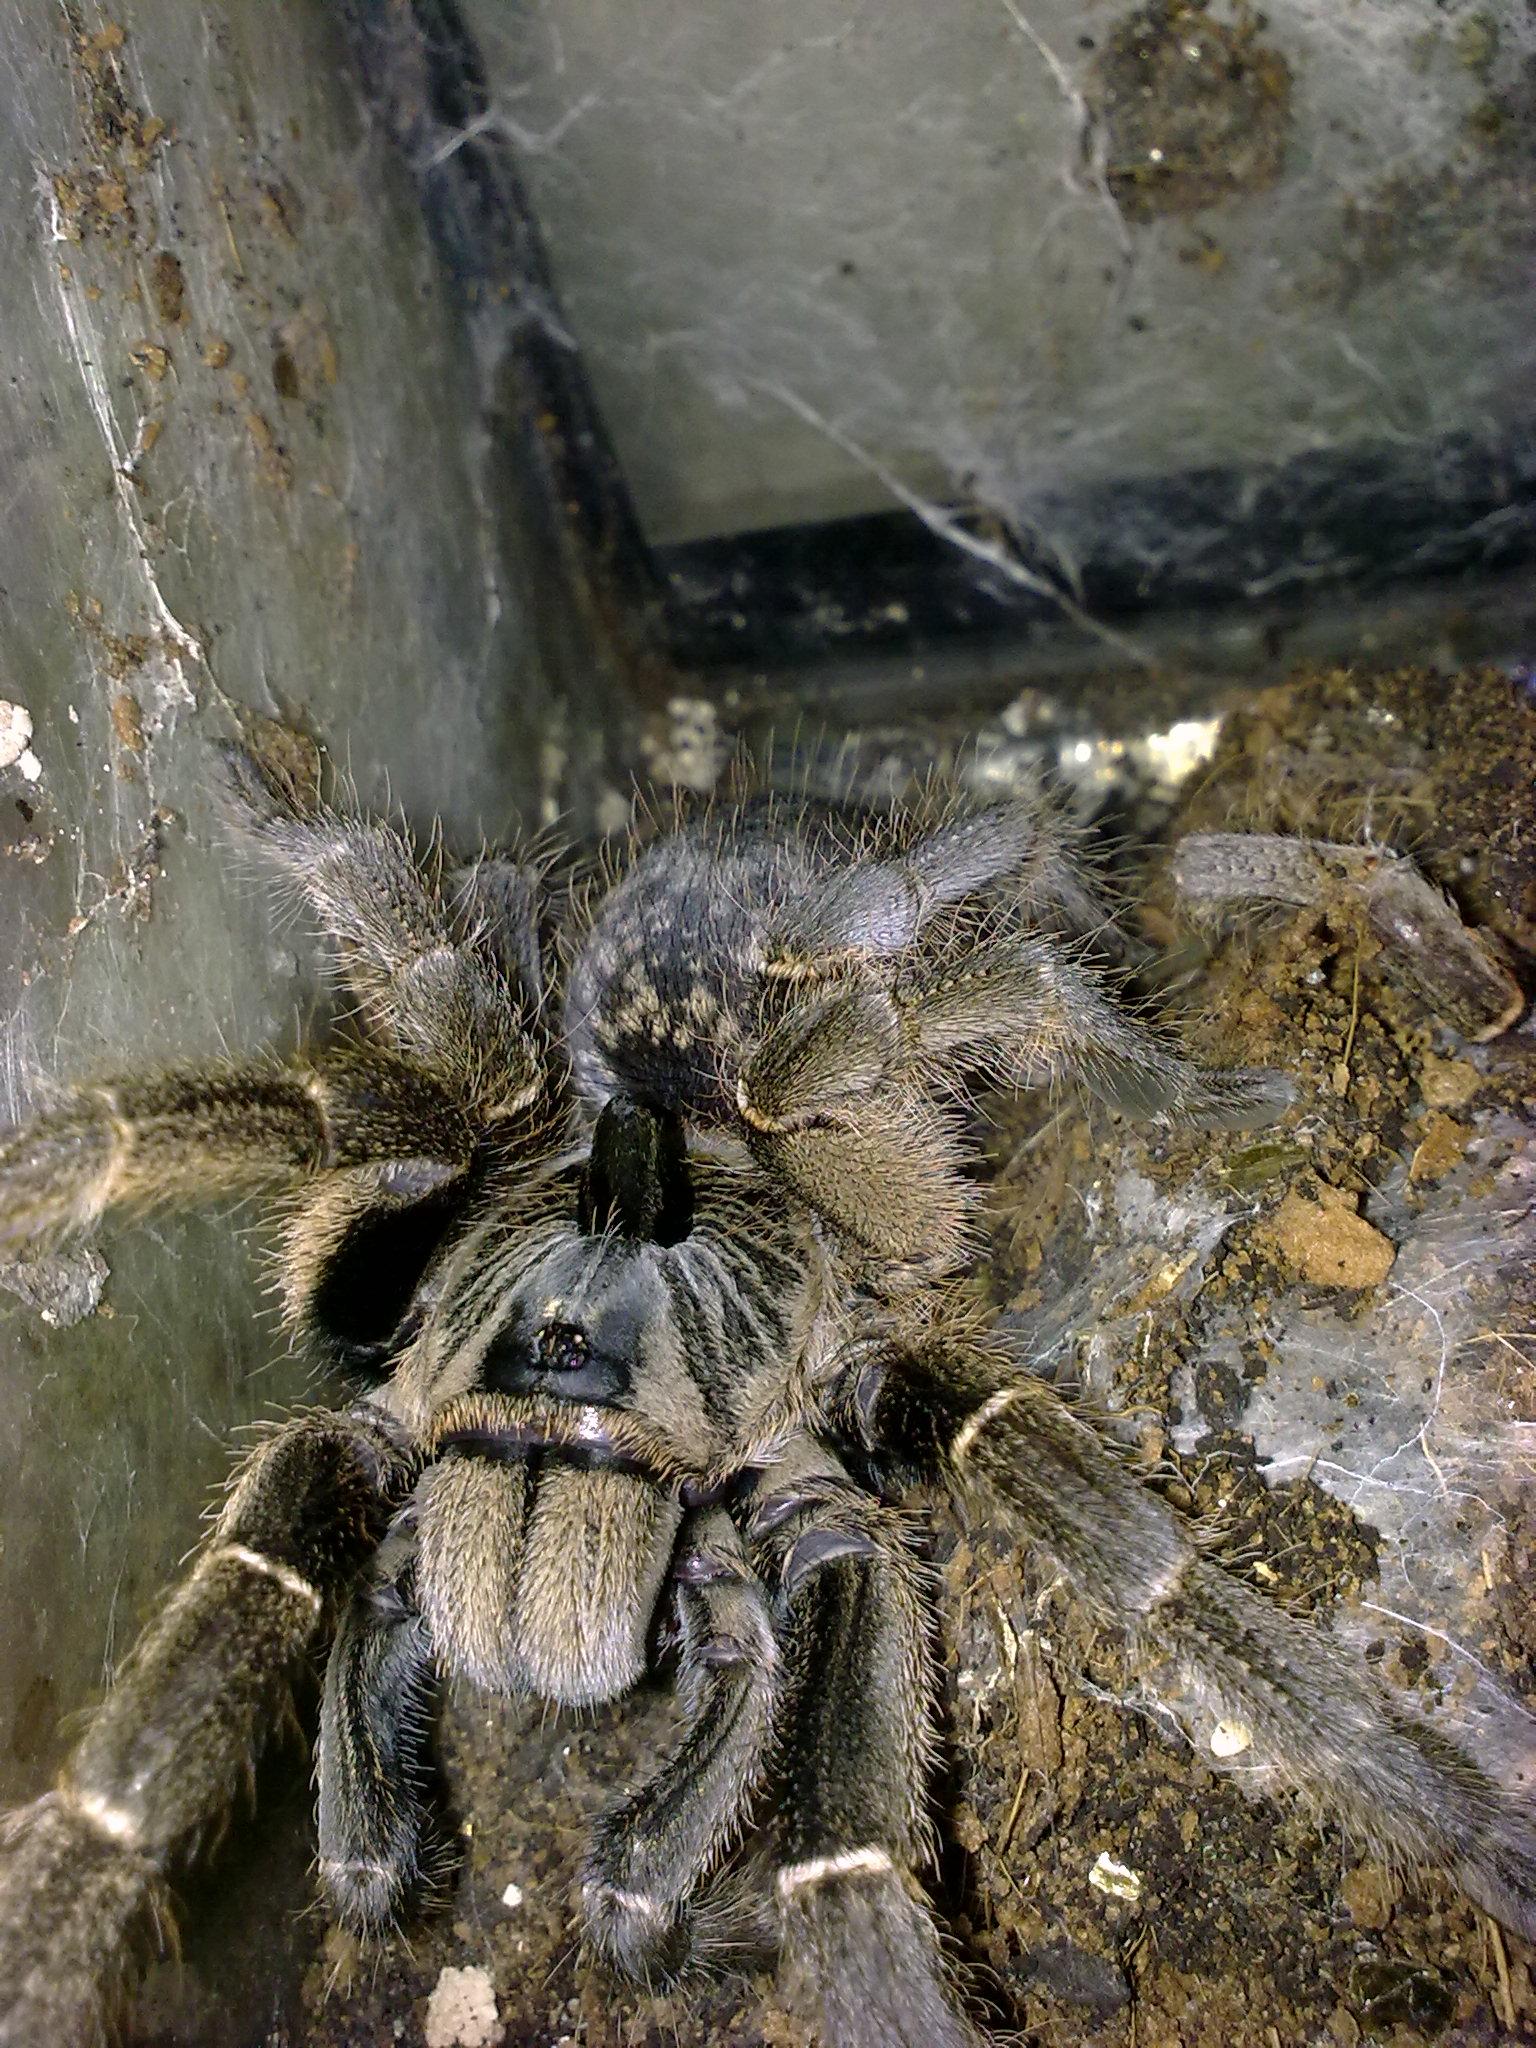 Greater Horned Baboon Tarantula CB (Ceratogyrus marshalli) Image